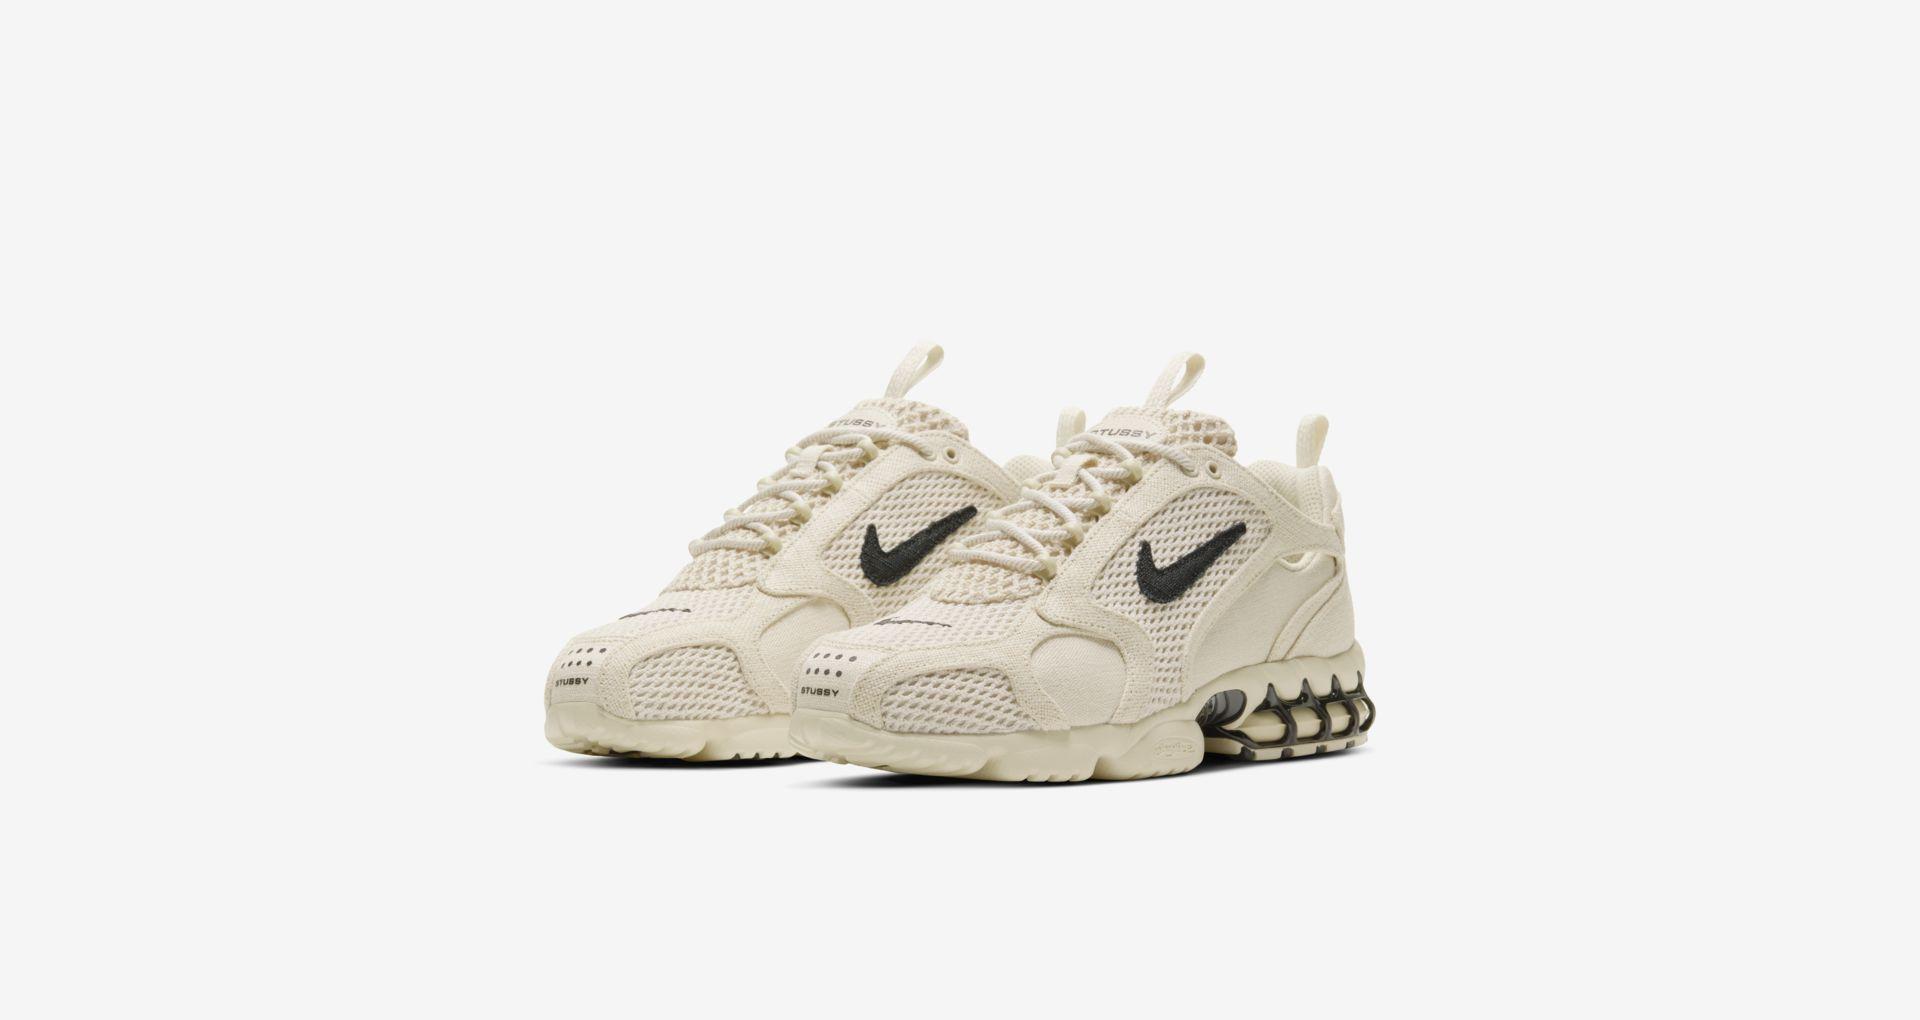 Stüssy,Nike,CU1854-001,CQ5486-  Stüssy x Nike 聯名明早 9 點發售!泫雅搶先上腳!